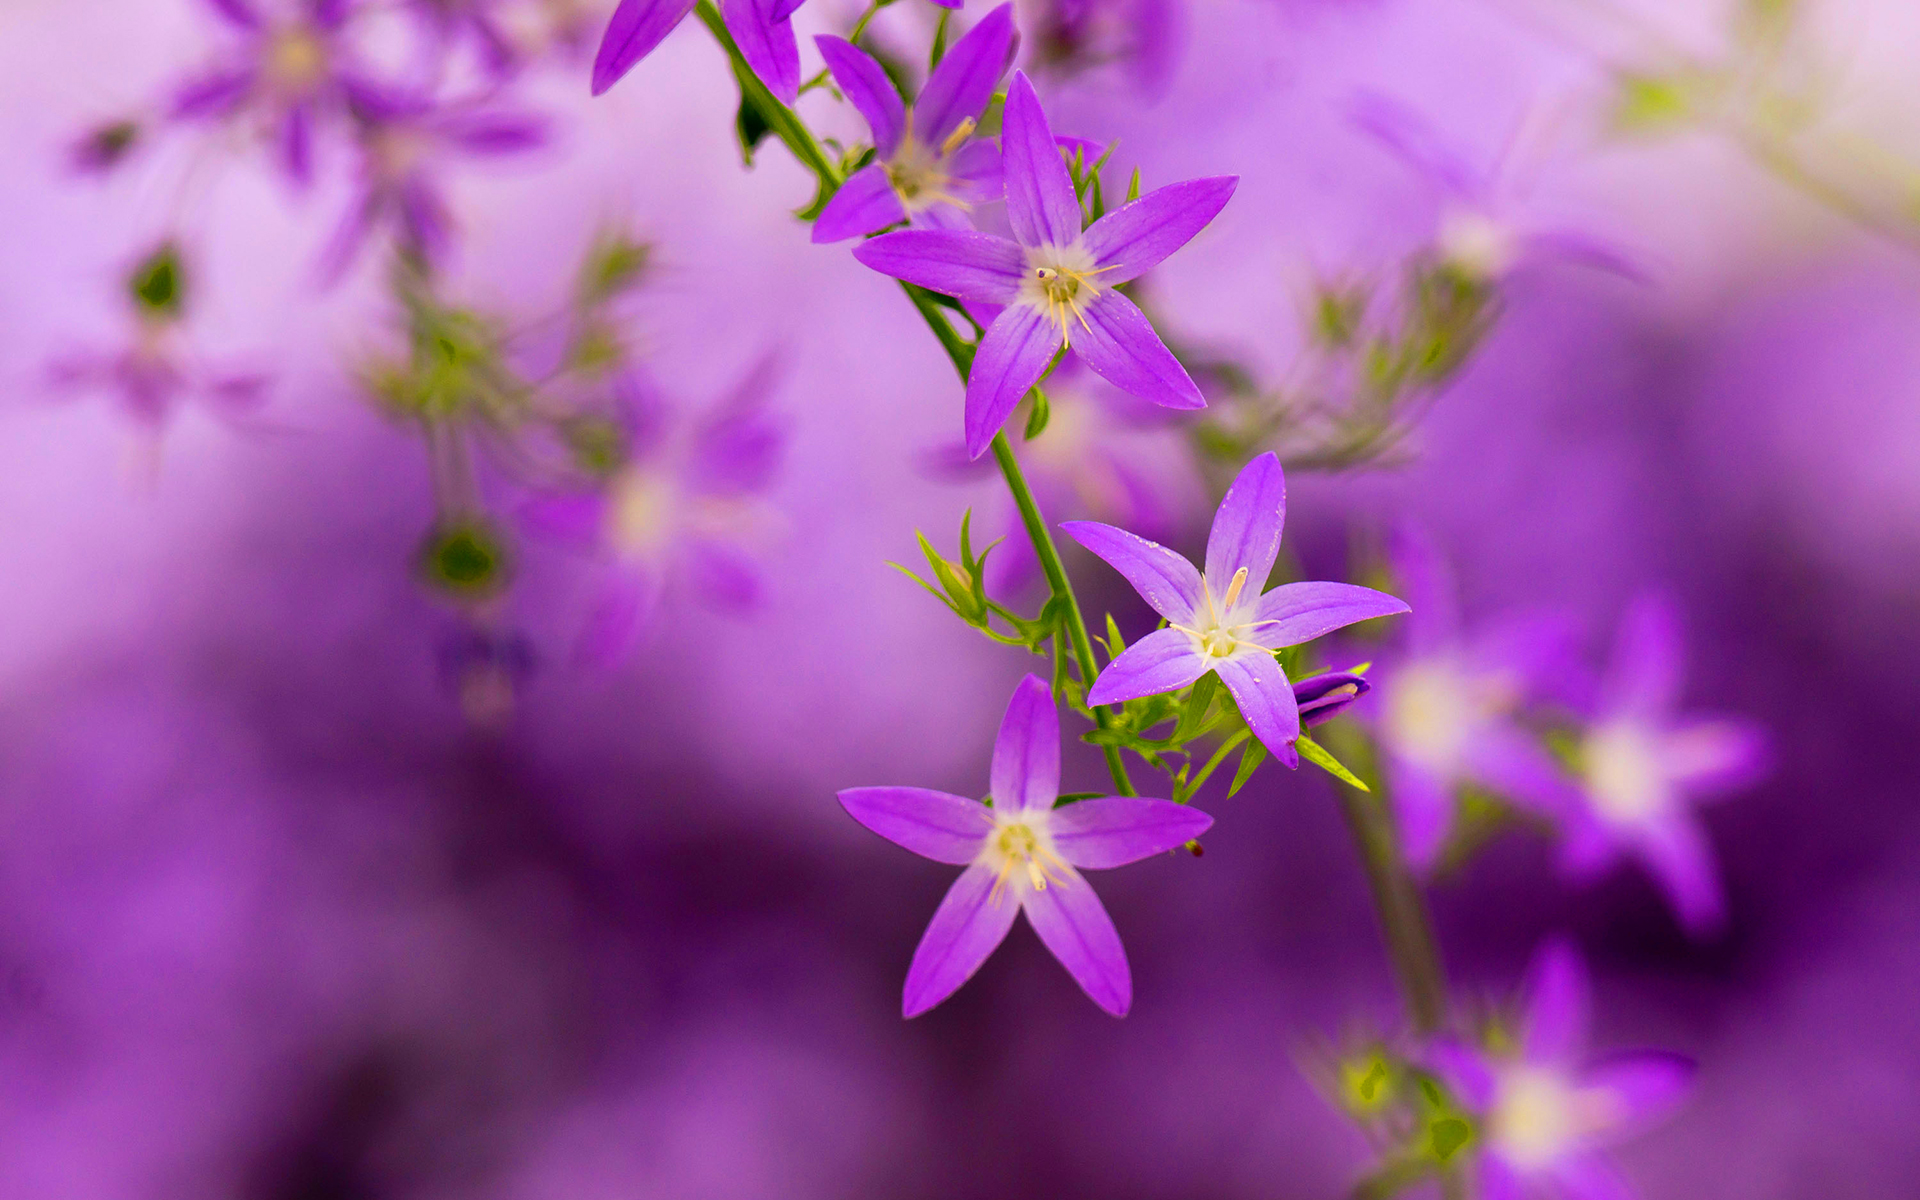 Purple Blooming Hd Desktop Wallpapers 4k Hd